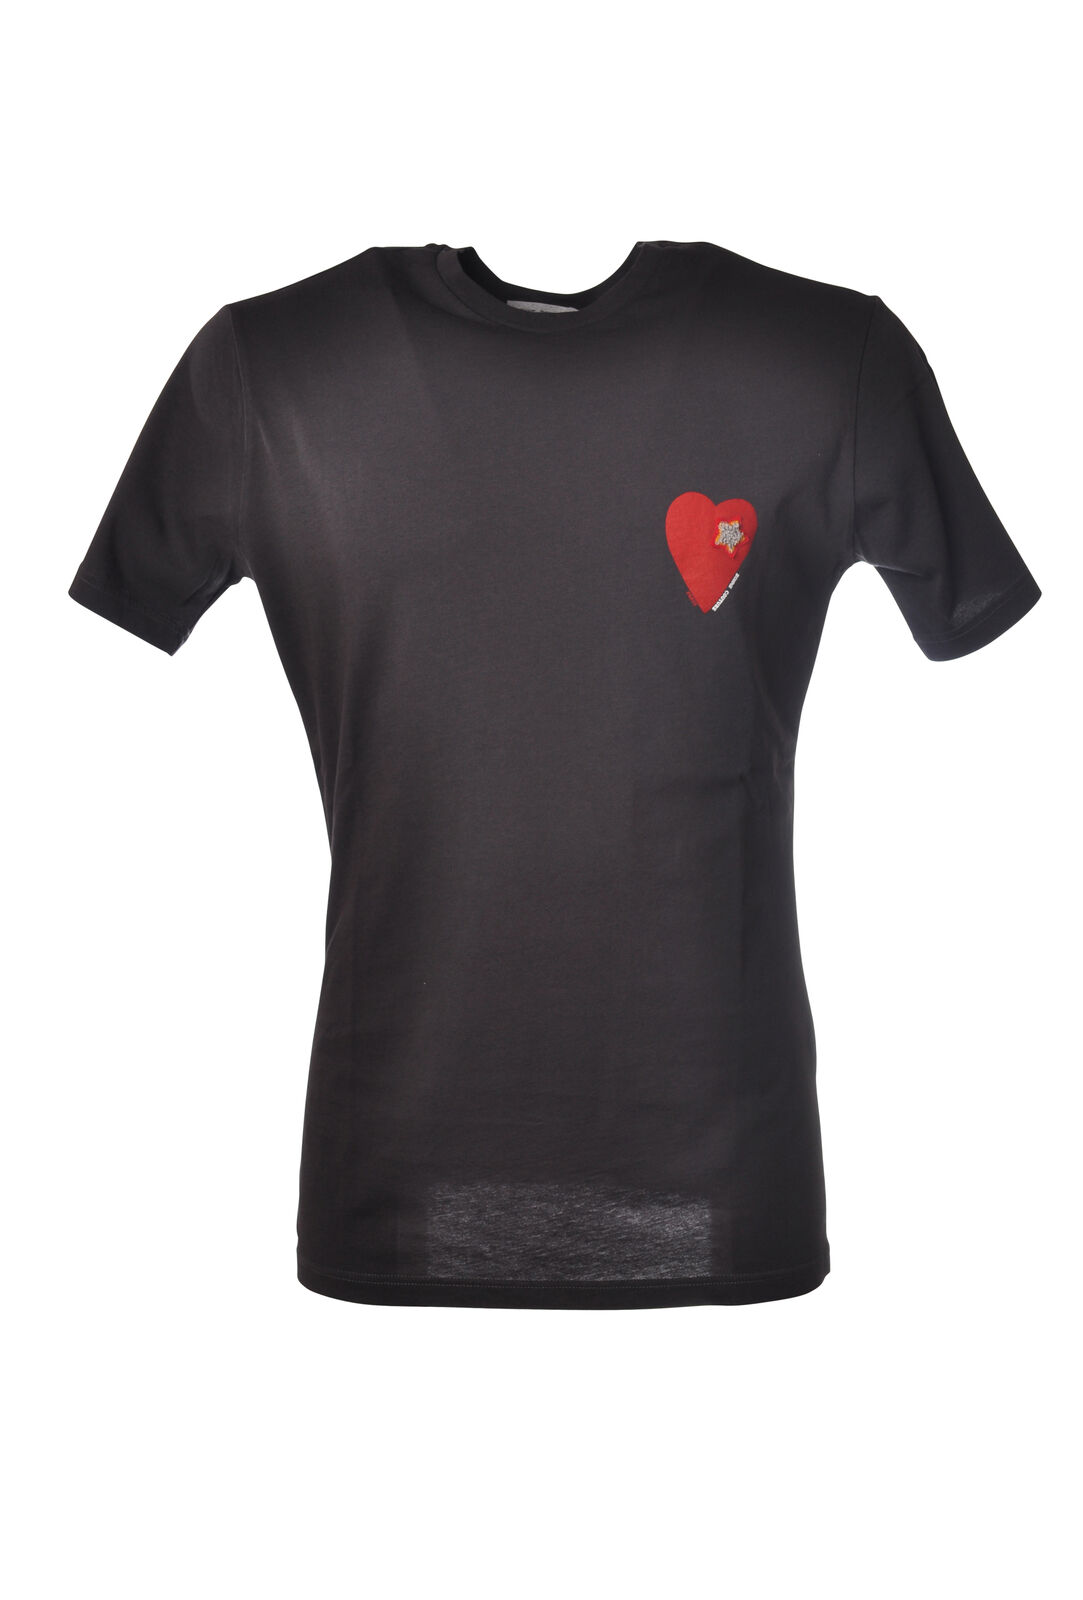 Daniele Alessandrini - Topwear-T-shirts - Man - Grey - 5288408E192044